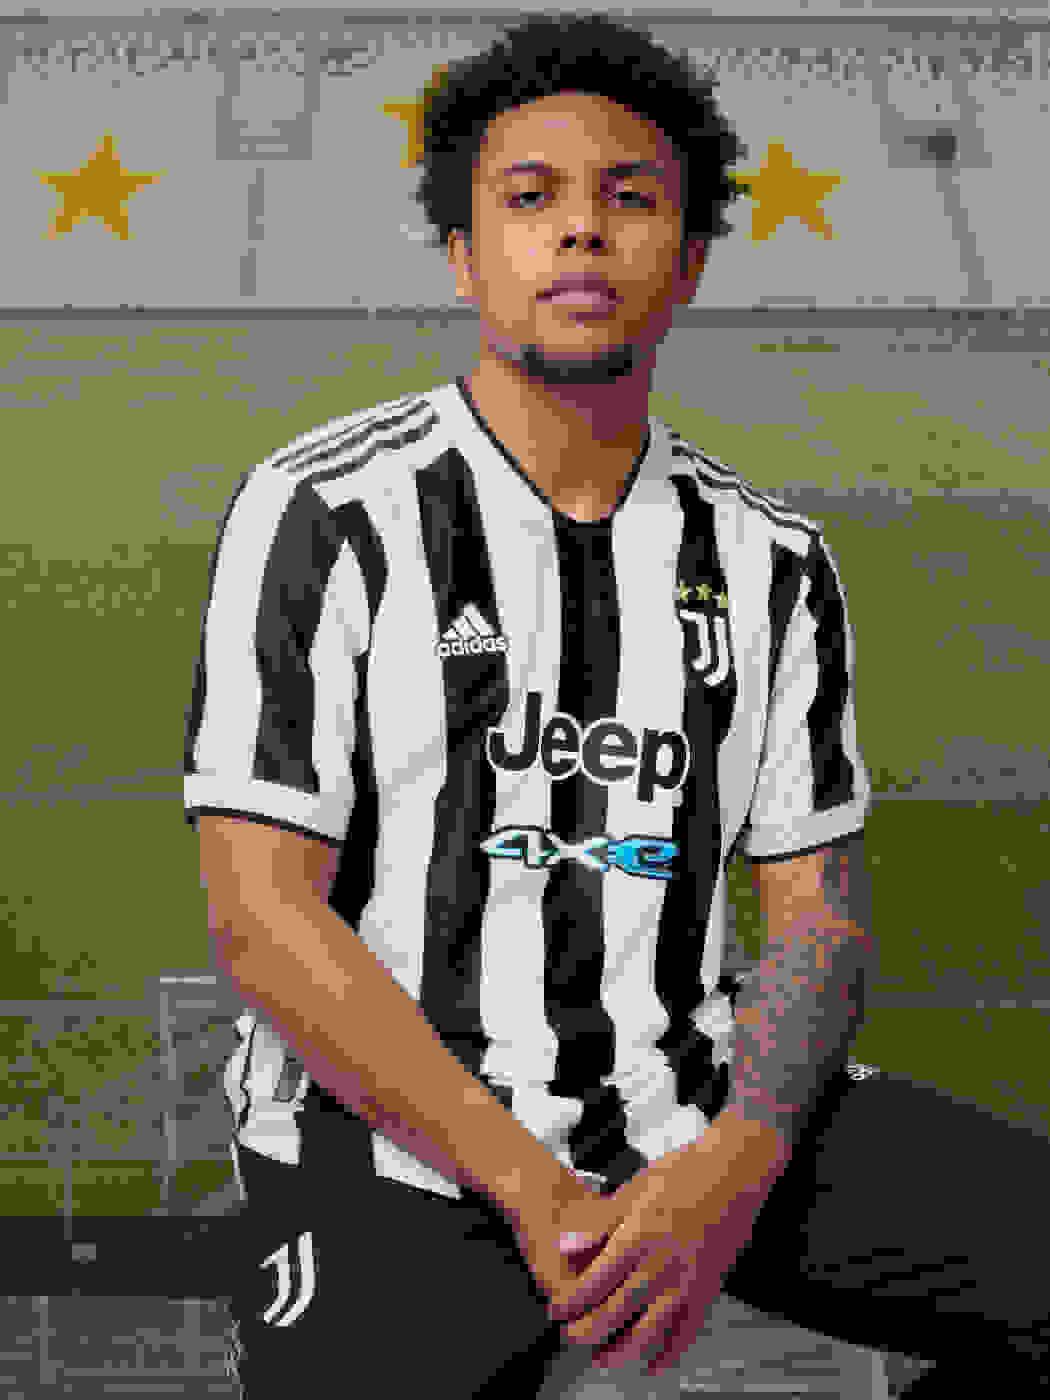 Male Player wearing Juventus Home Jersey